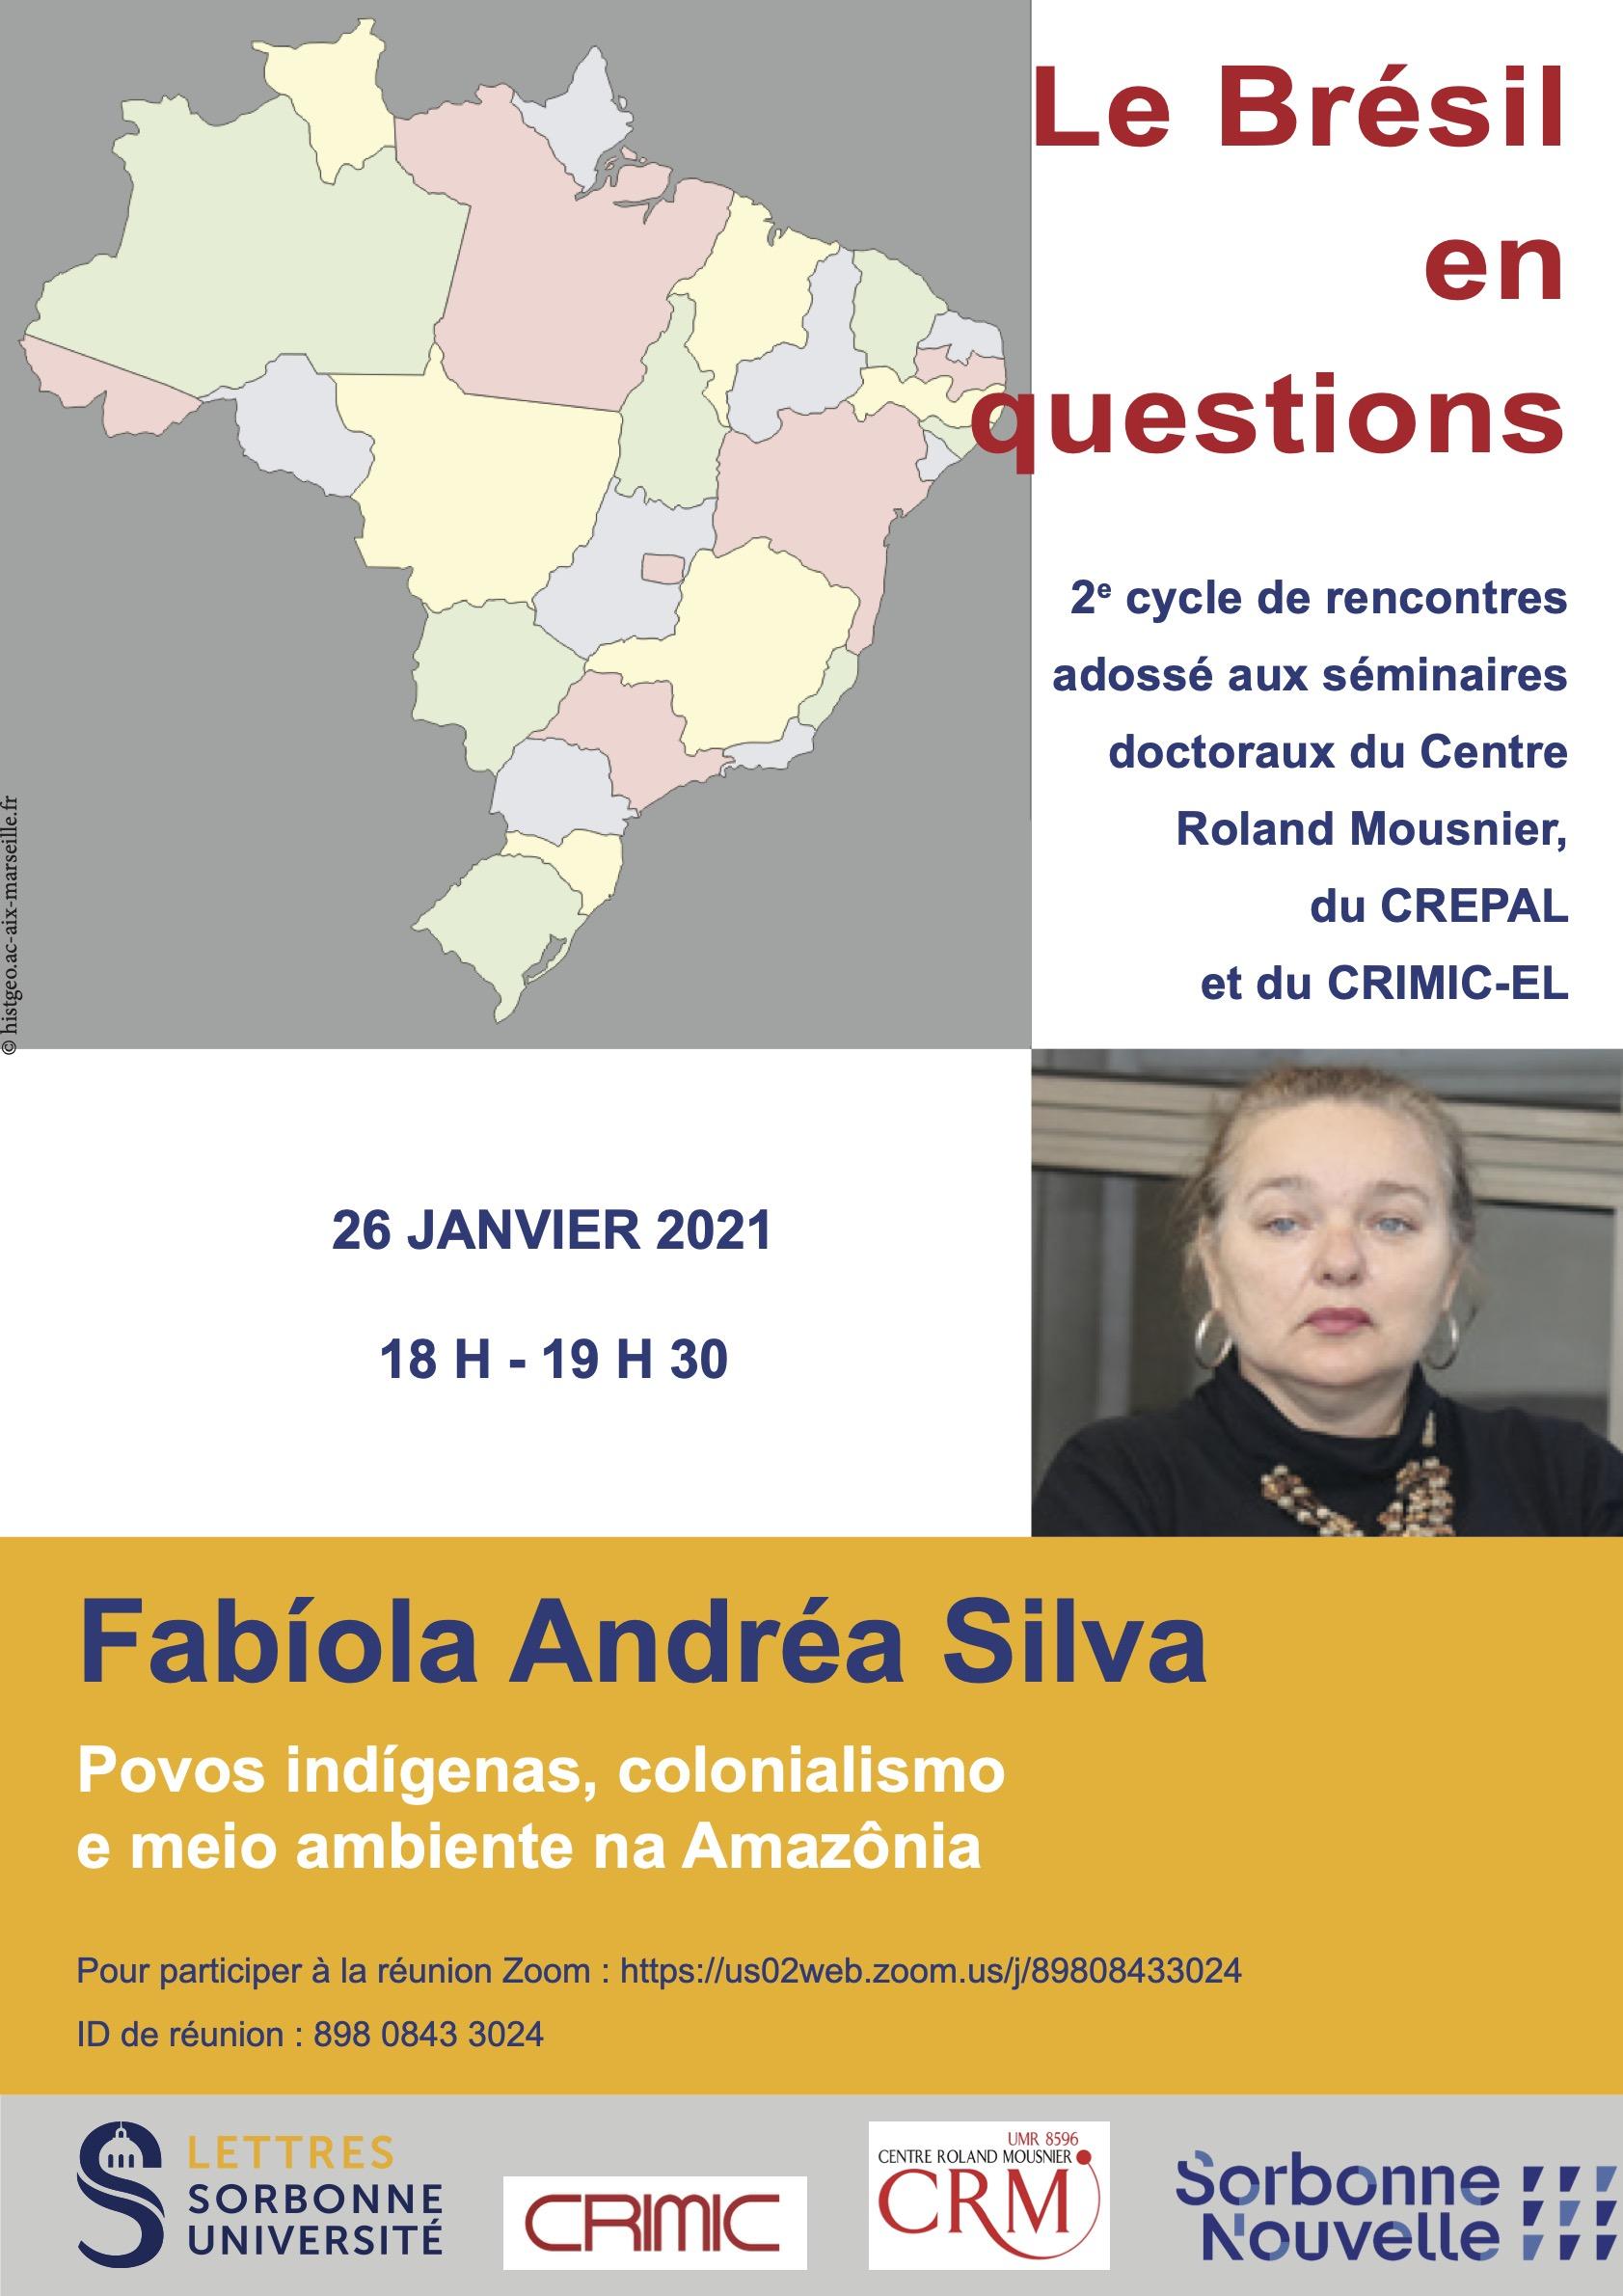 Fabíola Andréa Silva, « Povos Indígenas, colonialismo e meio ambiente na Amazônia»